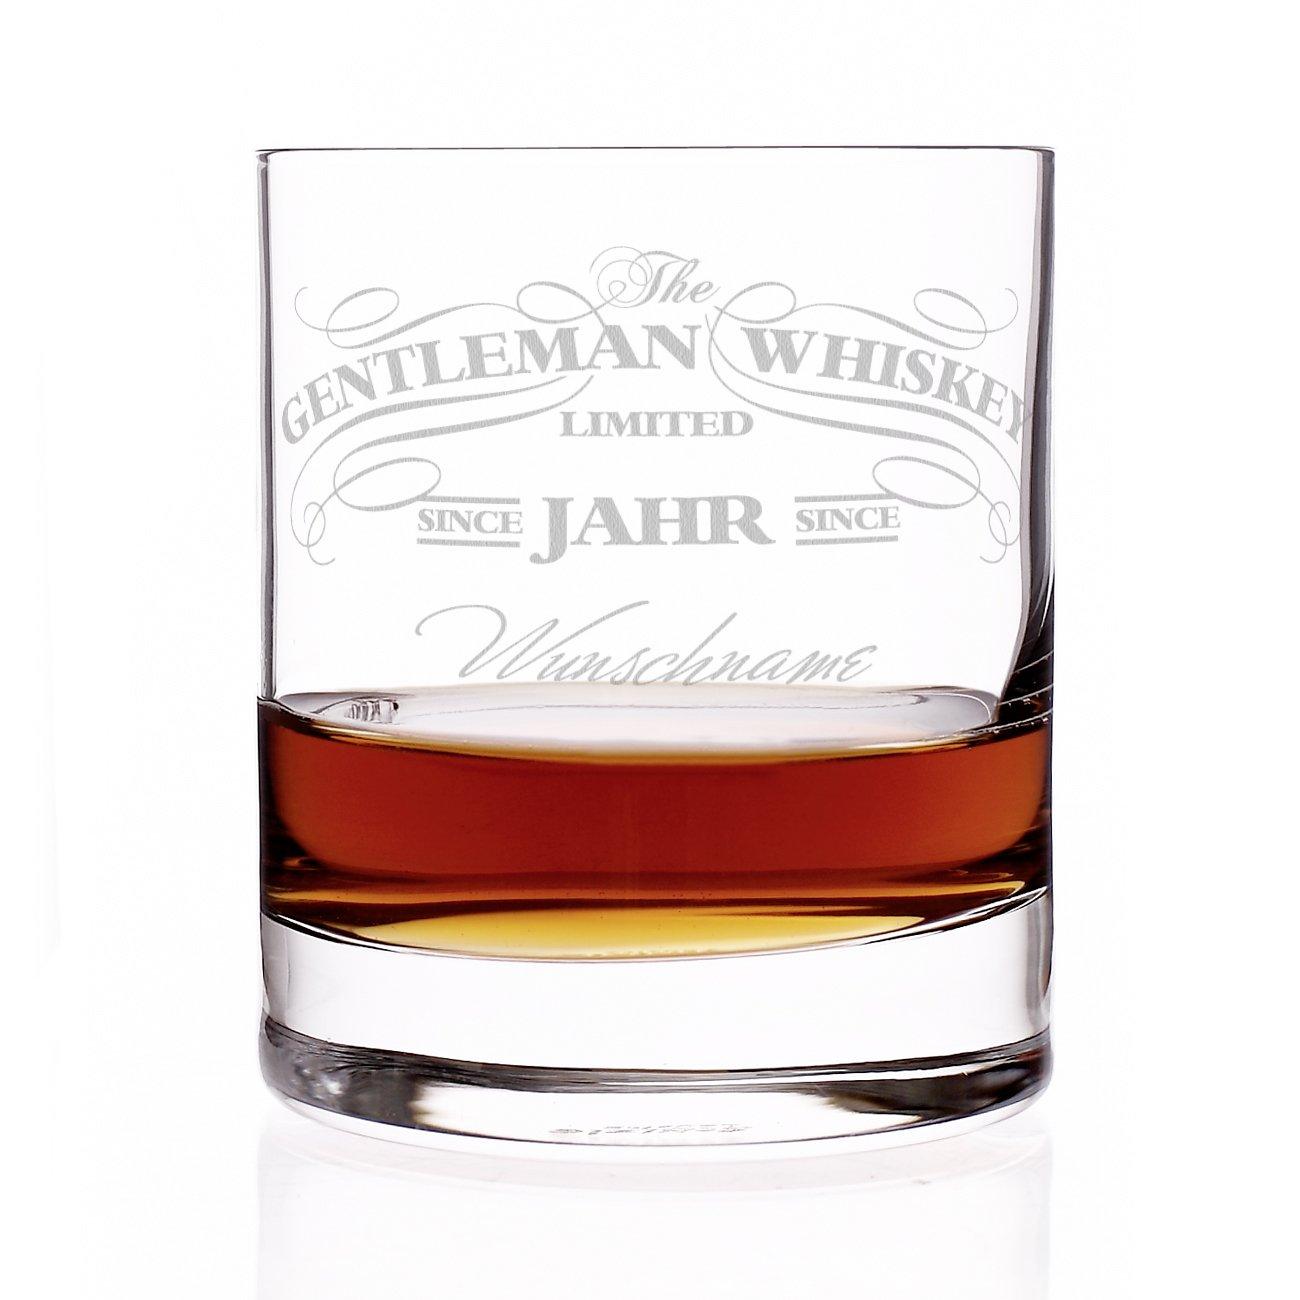 Privatglas Whiskey Glas - Gentleman Whiskey Design - Gratis Gravur ...